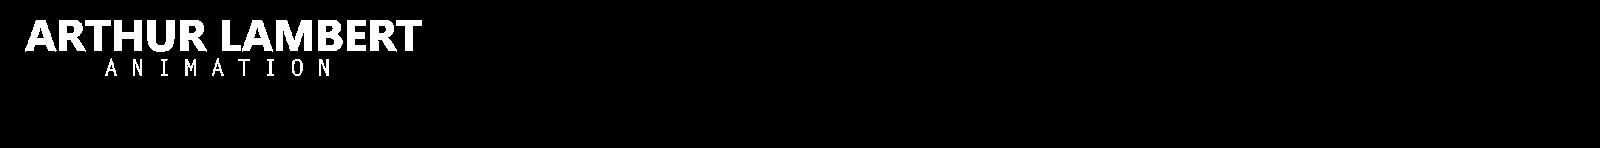 arthur lambert animator